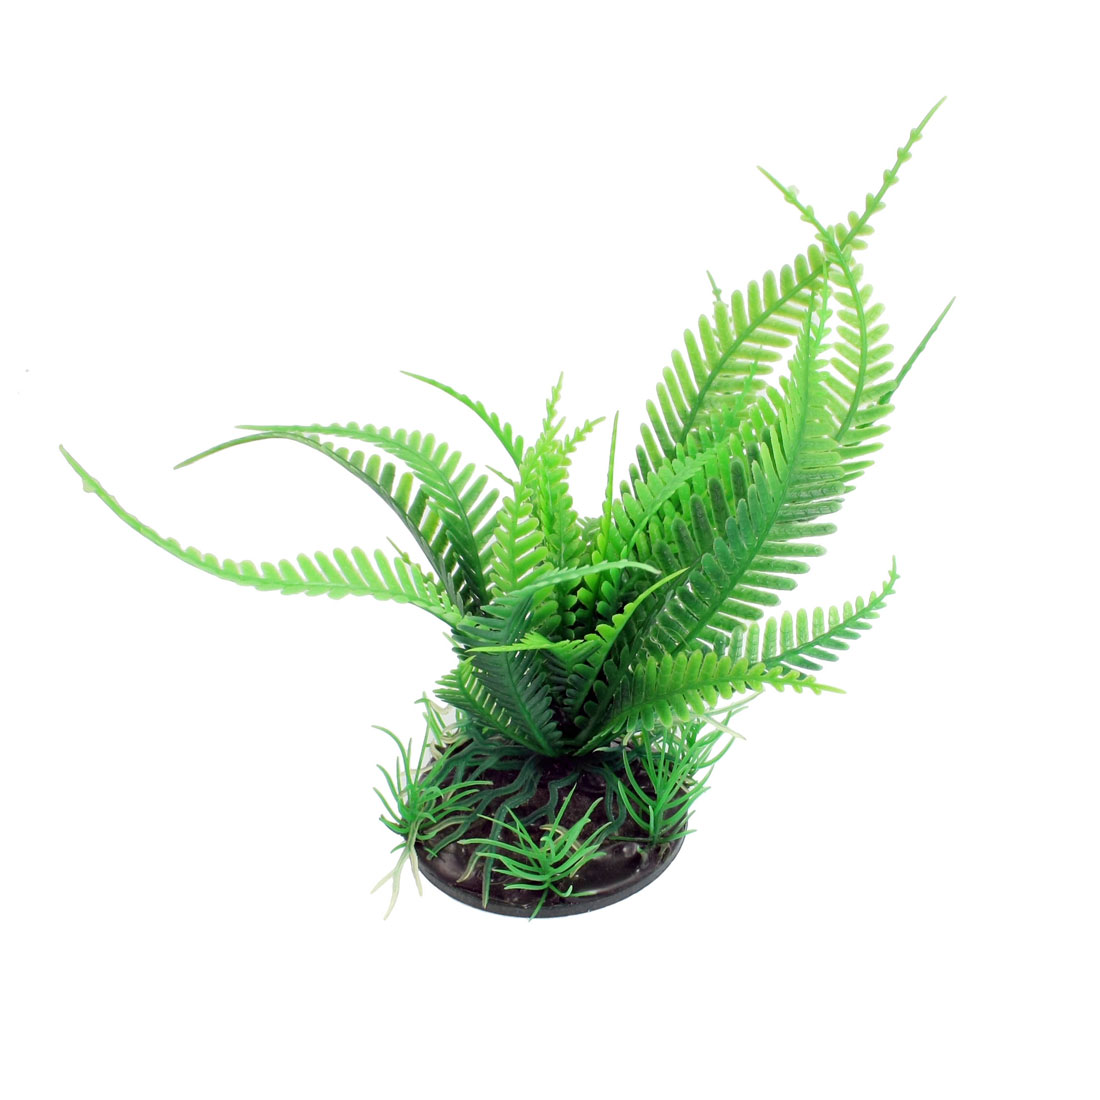 "5.1"" Height Green Fern Leaves Aquarium Aquascaping Simulation Plant Decoration"